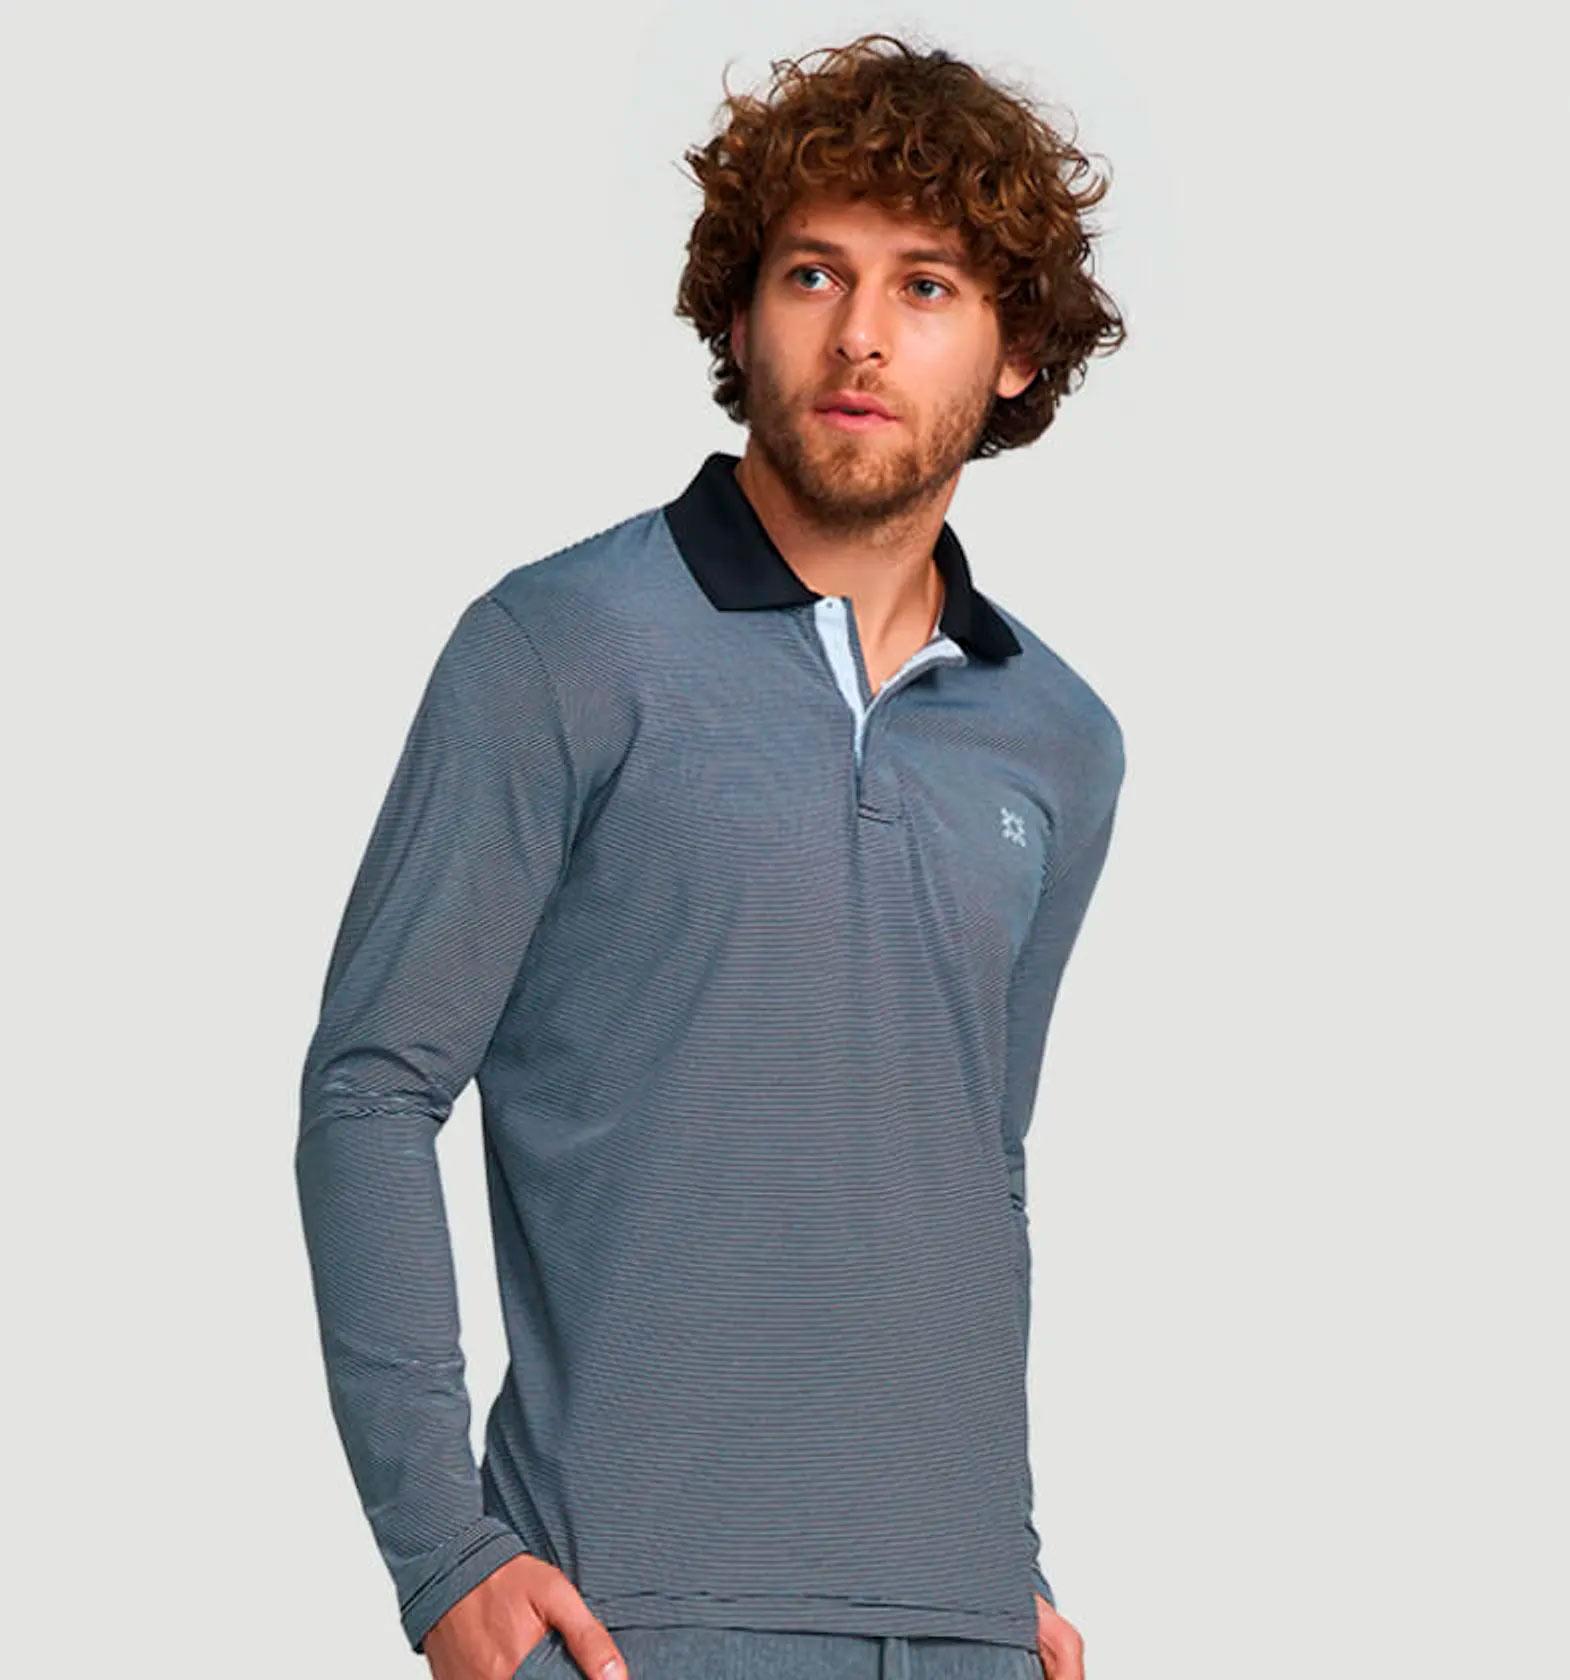 UV LINE Camiseta Polo Mescla Masculina Manga Longa Cinza Proteção Solar